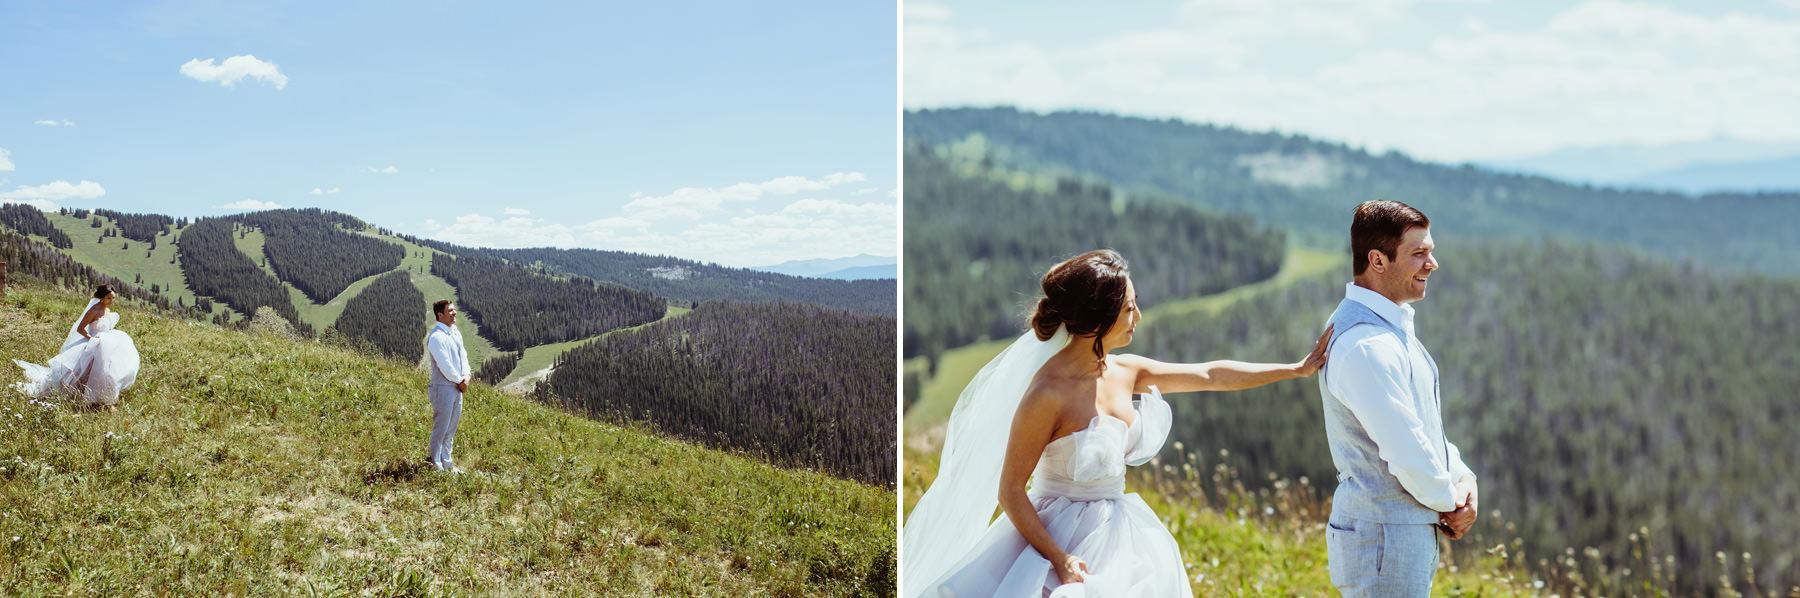 Vail Colorado Wedding Deck_ Kindling Wedding Photography19.JPG